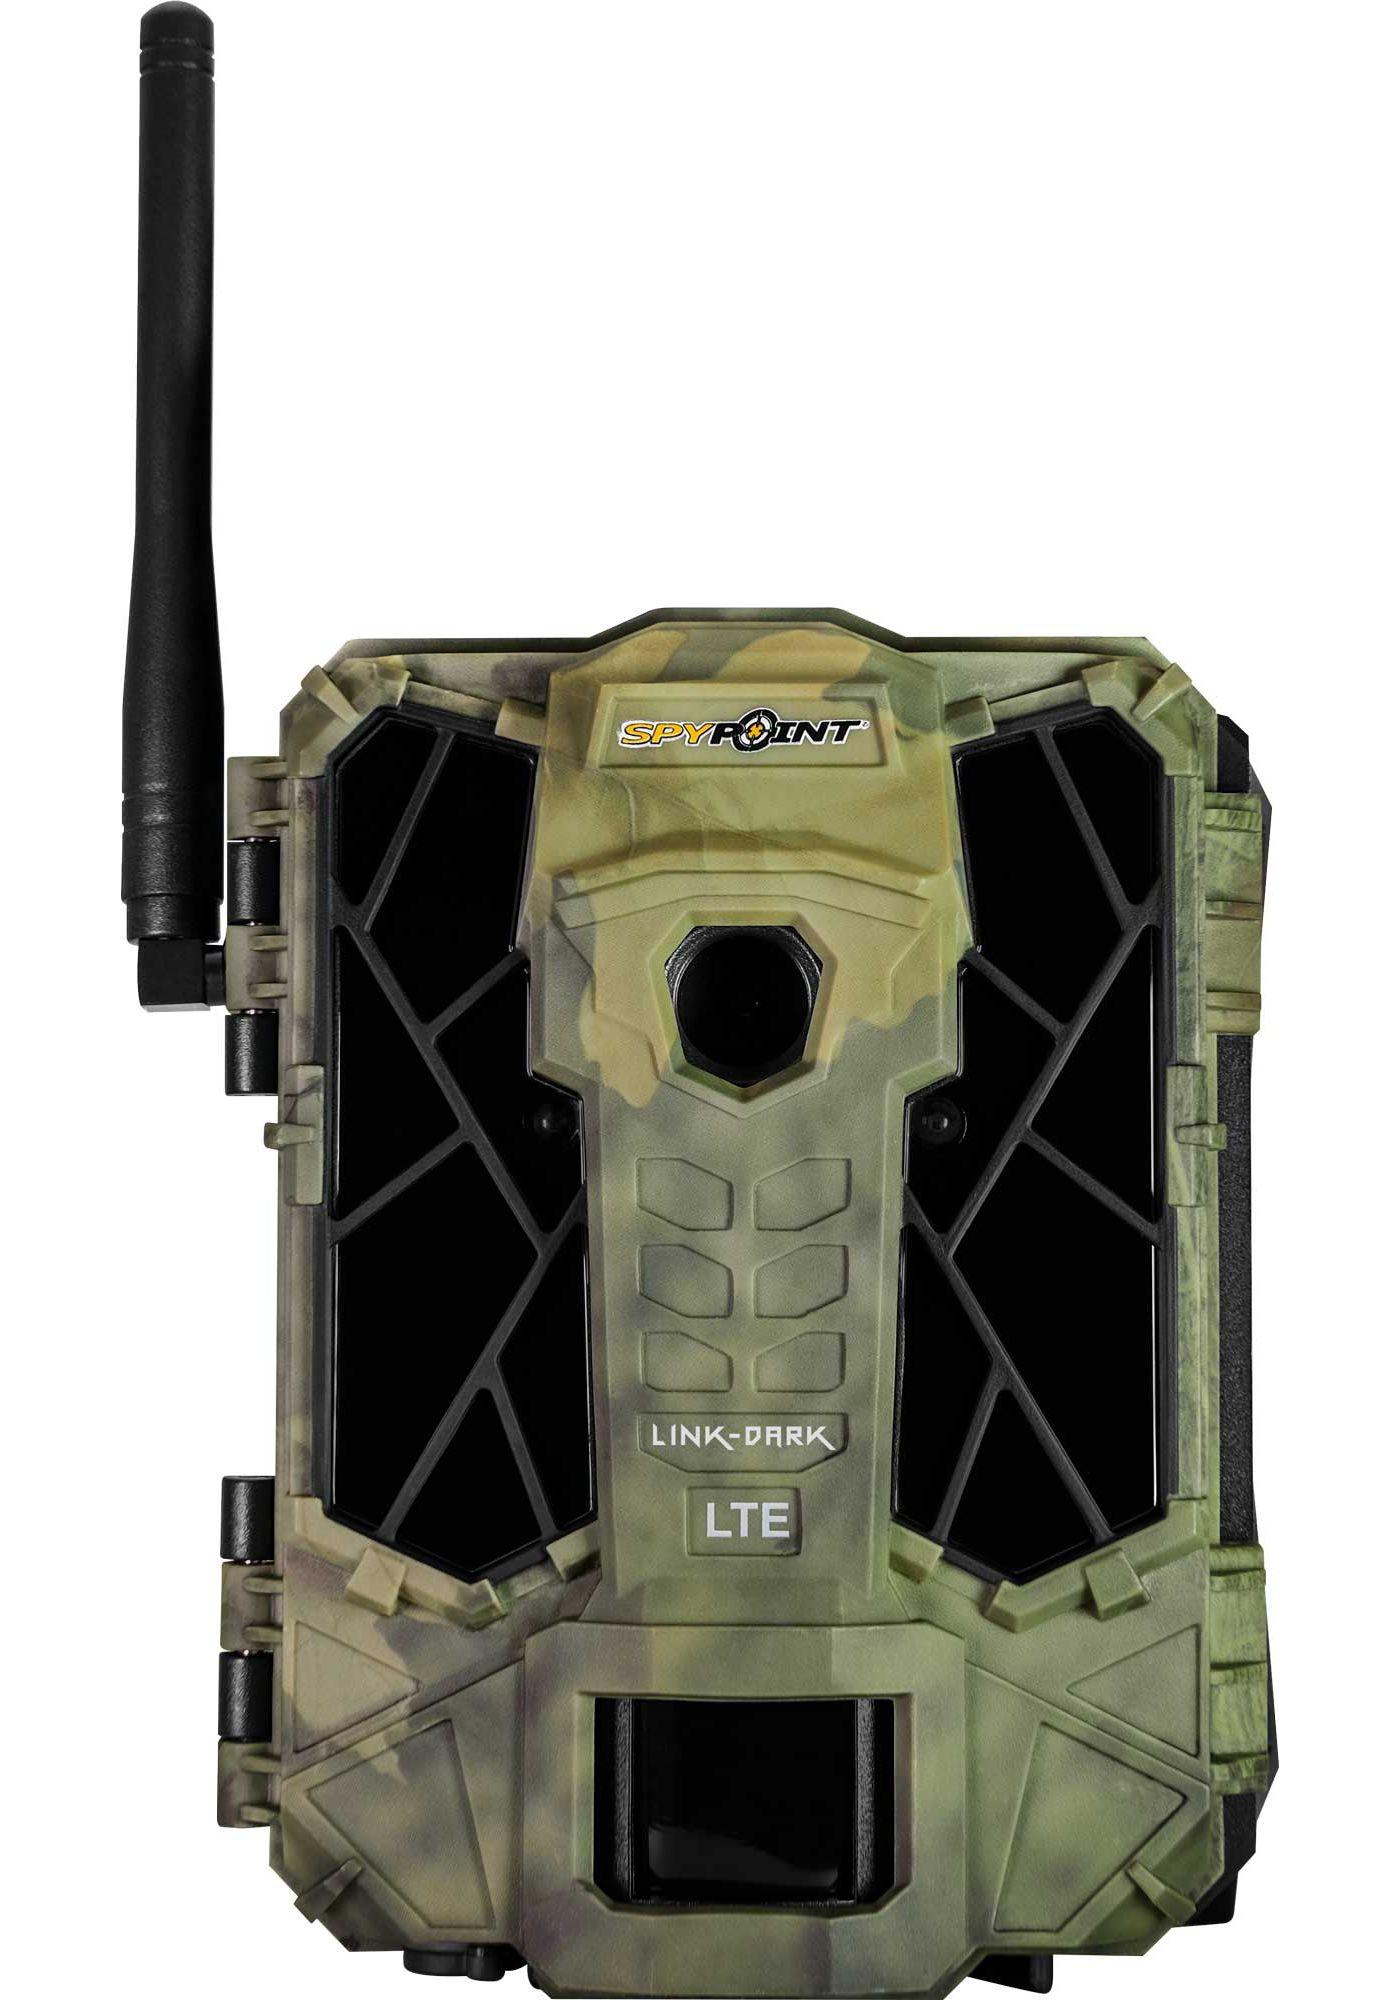 Spypoint Link-Dark Cellular Trail Camera